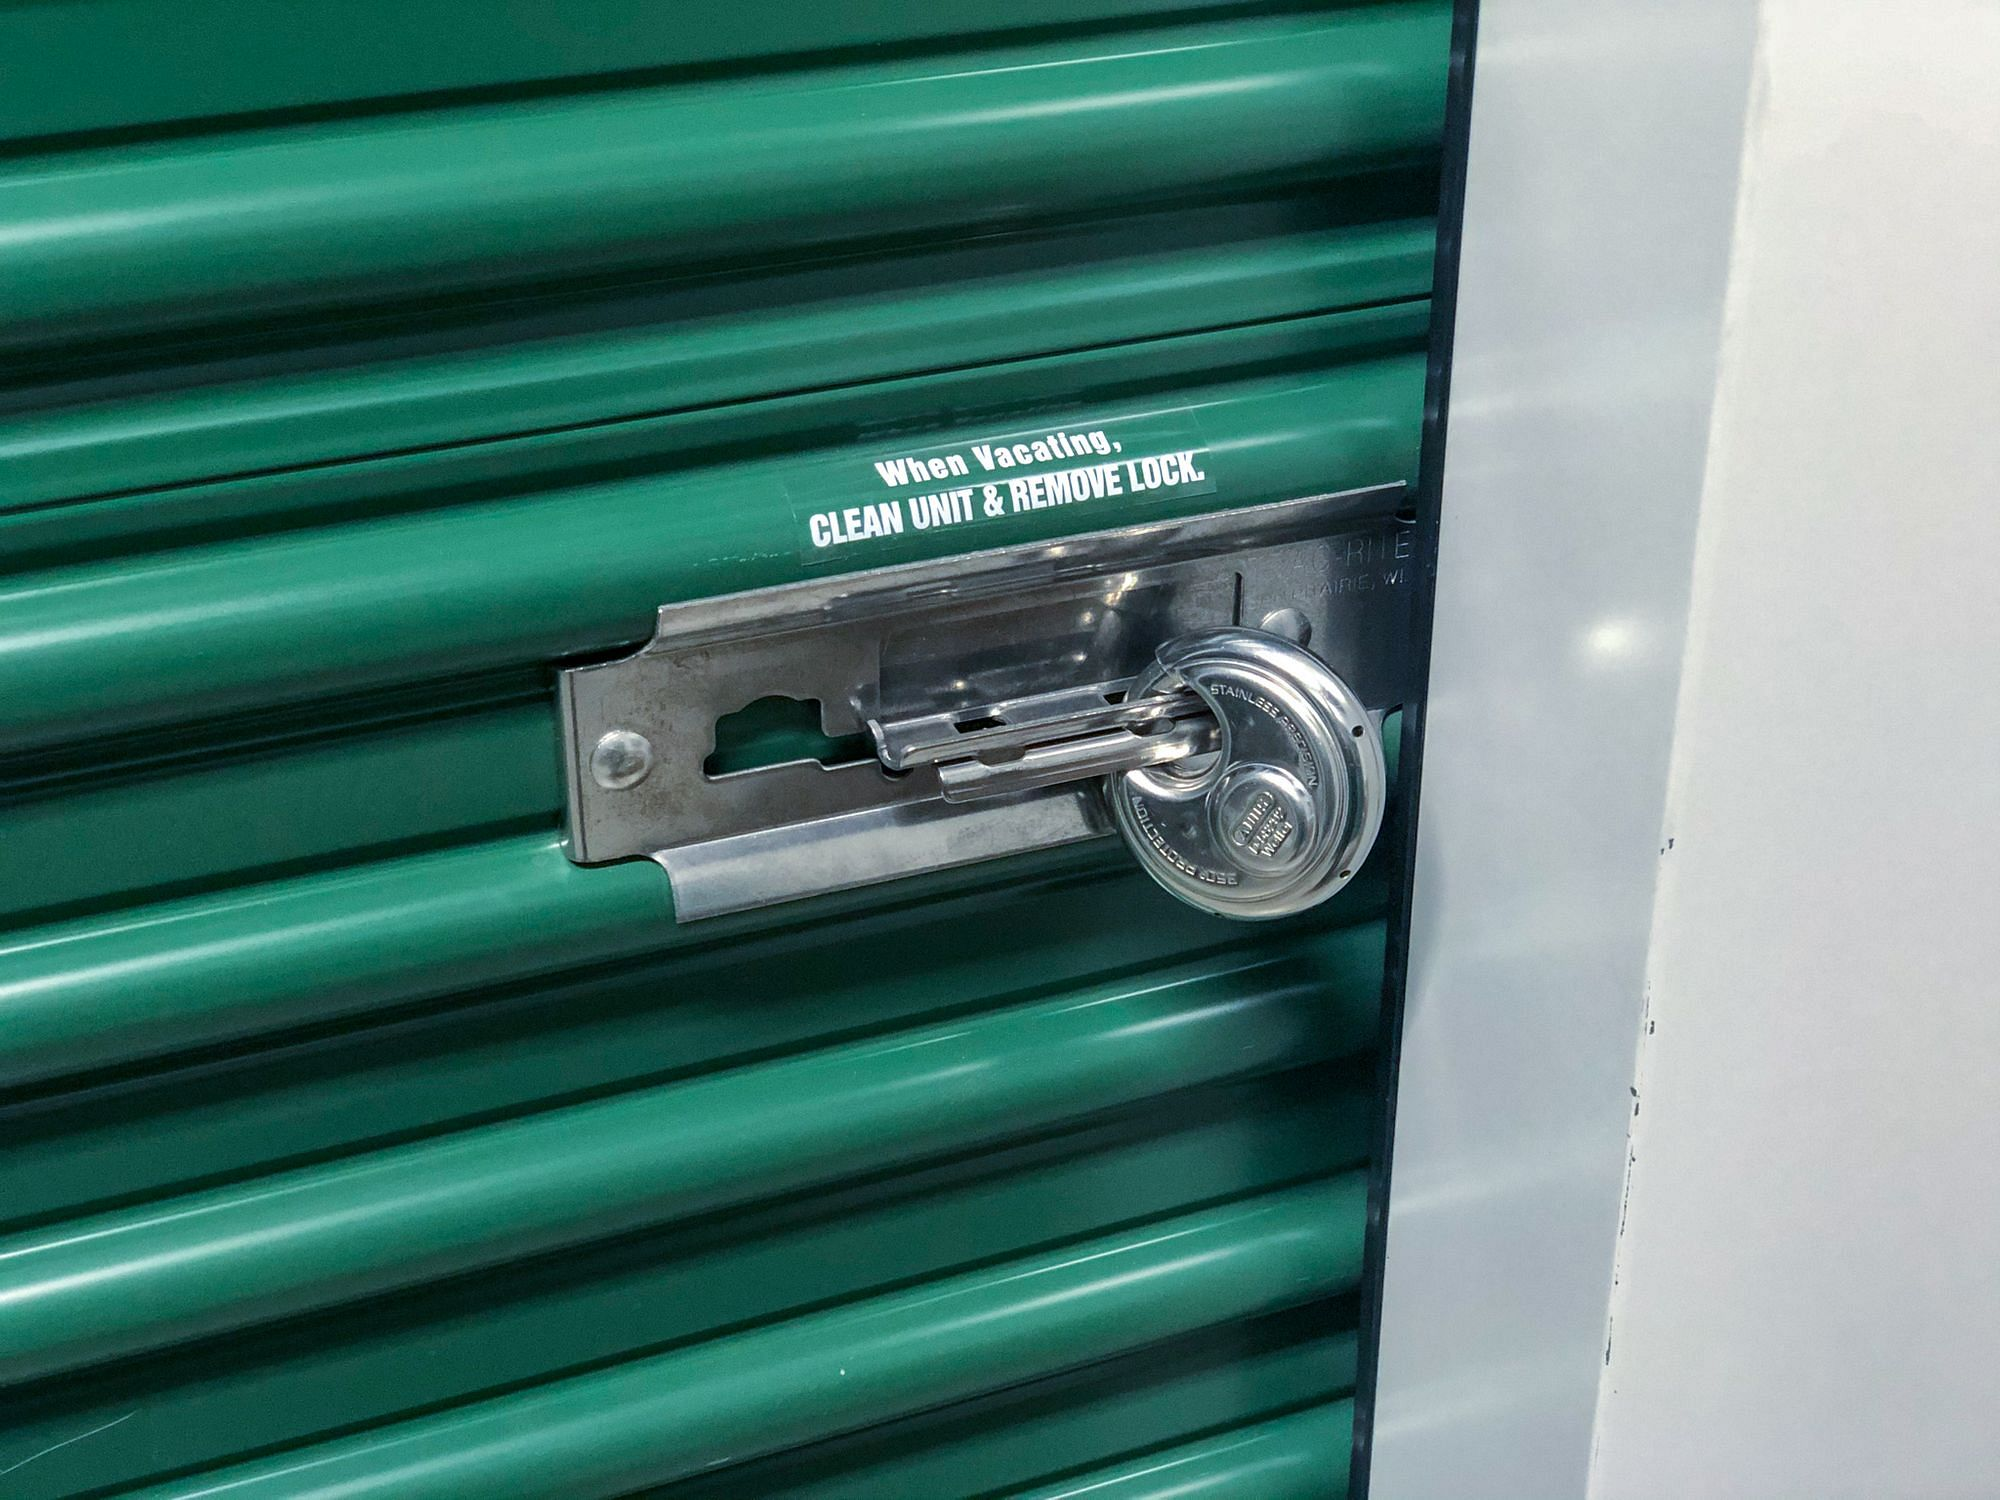 Securing Storage Unit Door